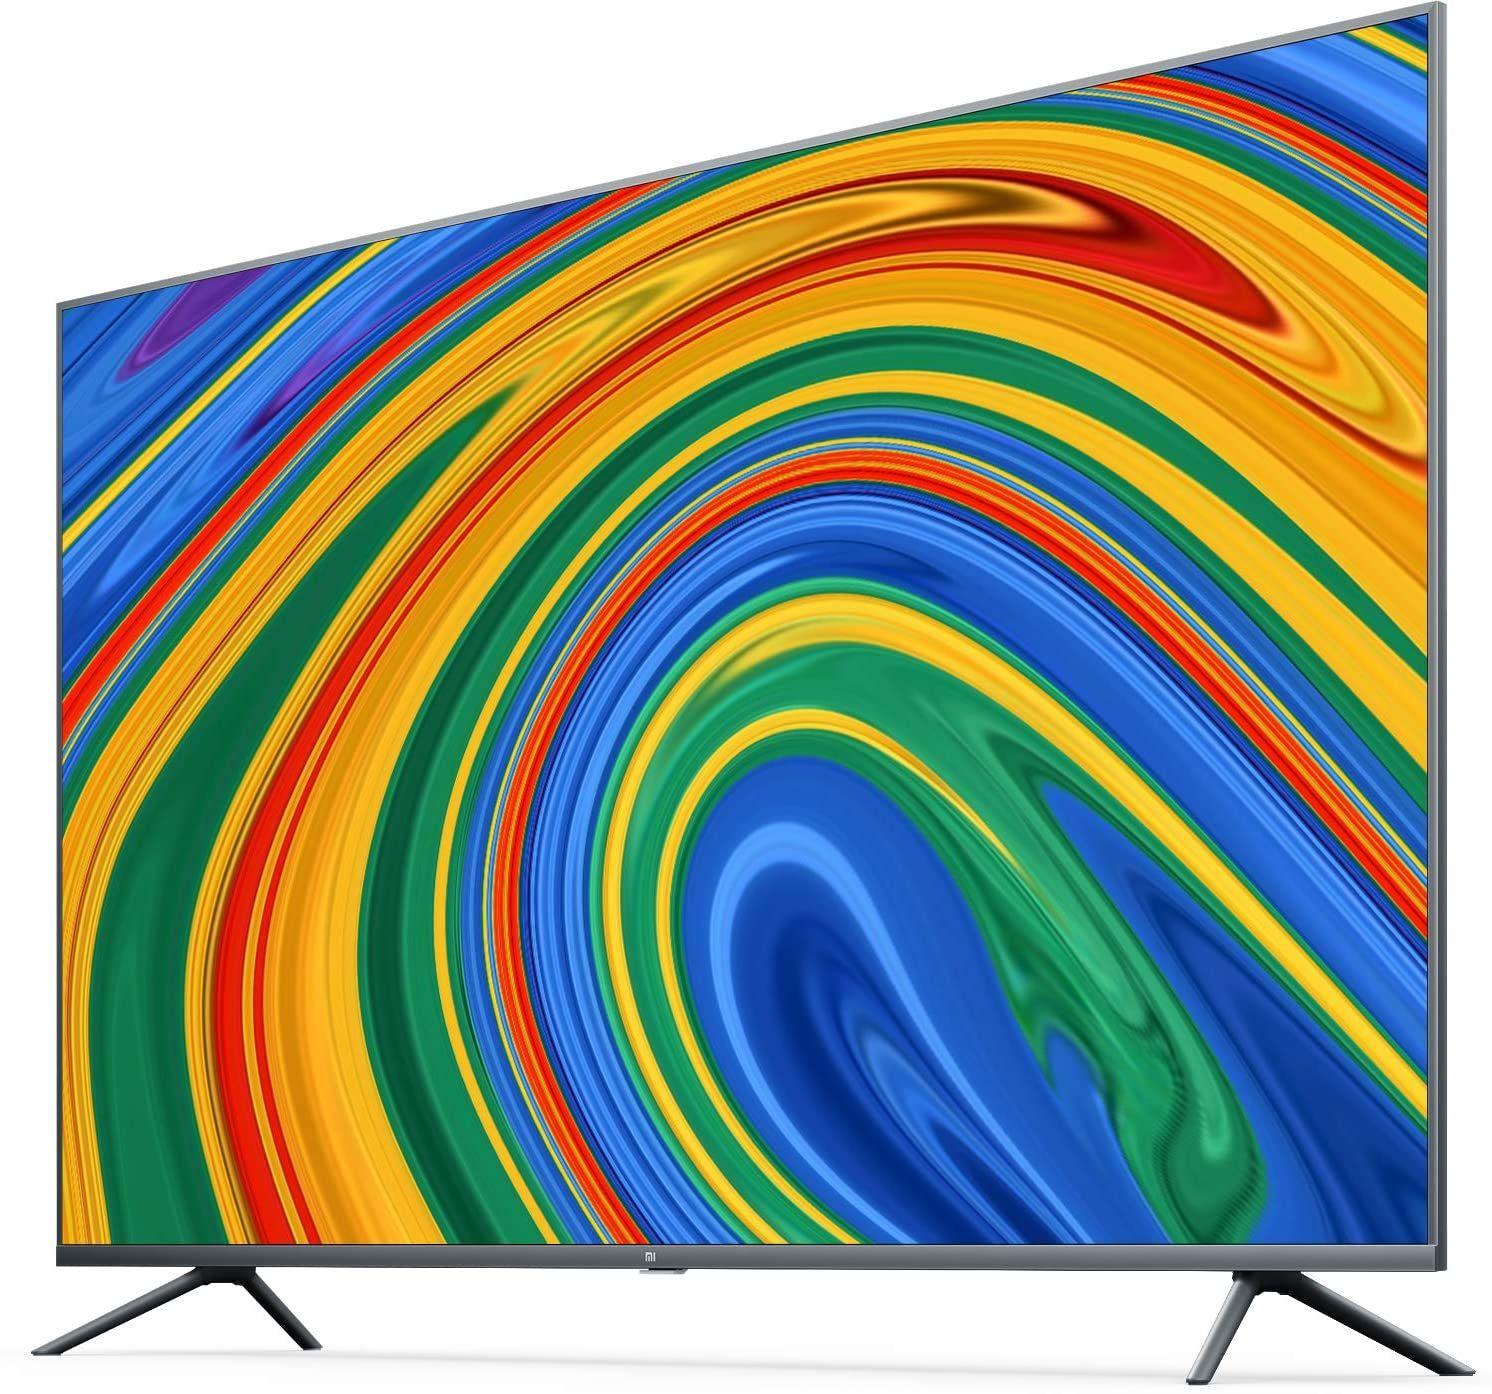 "Xiaomi Smart TV 4S 65"" Fernseher - 517€ möglich (4K Ultra HD, Triple Tuner, Android TV, Prime Video / Netflix)"